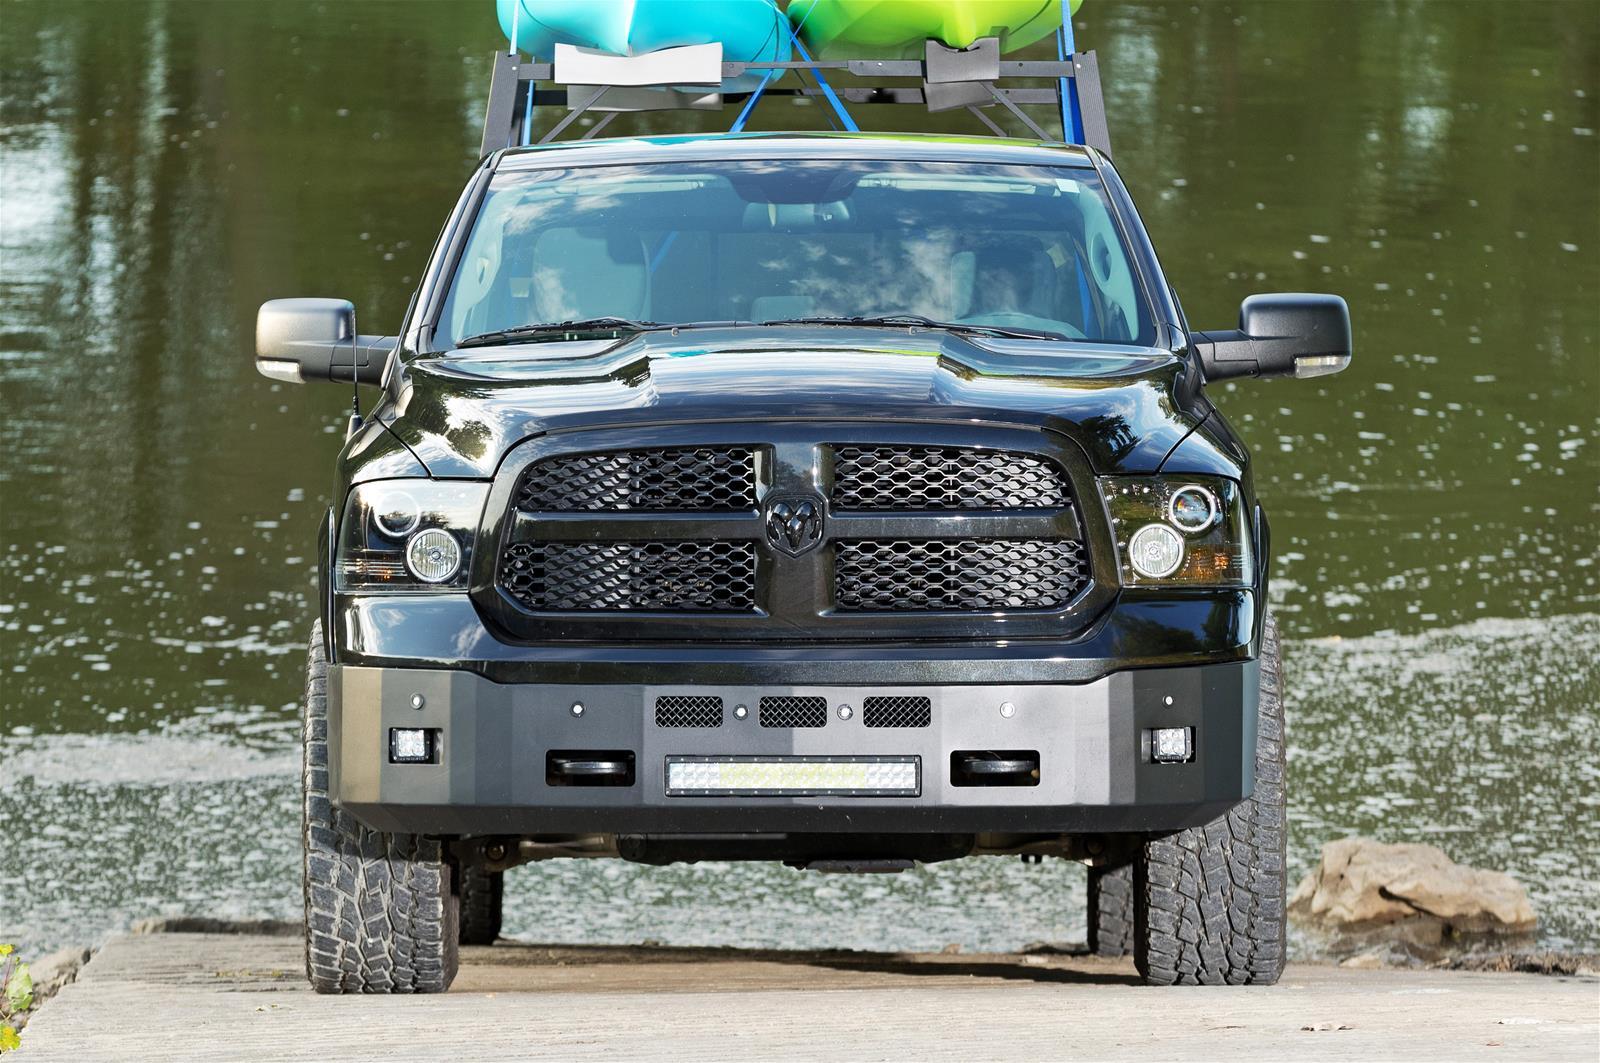 09 18 Dodge Ram Offroad Bumpers 09 18 Dodge Ram Offroad Trail Bumpers 09 18 Dodge Ram 4x4 Bumpers 09 18 Dodge Ram Exterior Dress Up 09 18 Dodge Ram Dress Up 09 18 Dodge Ram Exterior Accessories